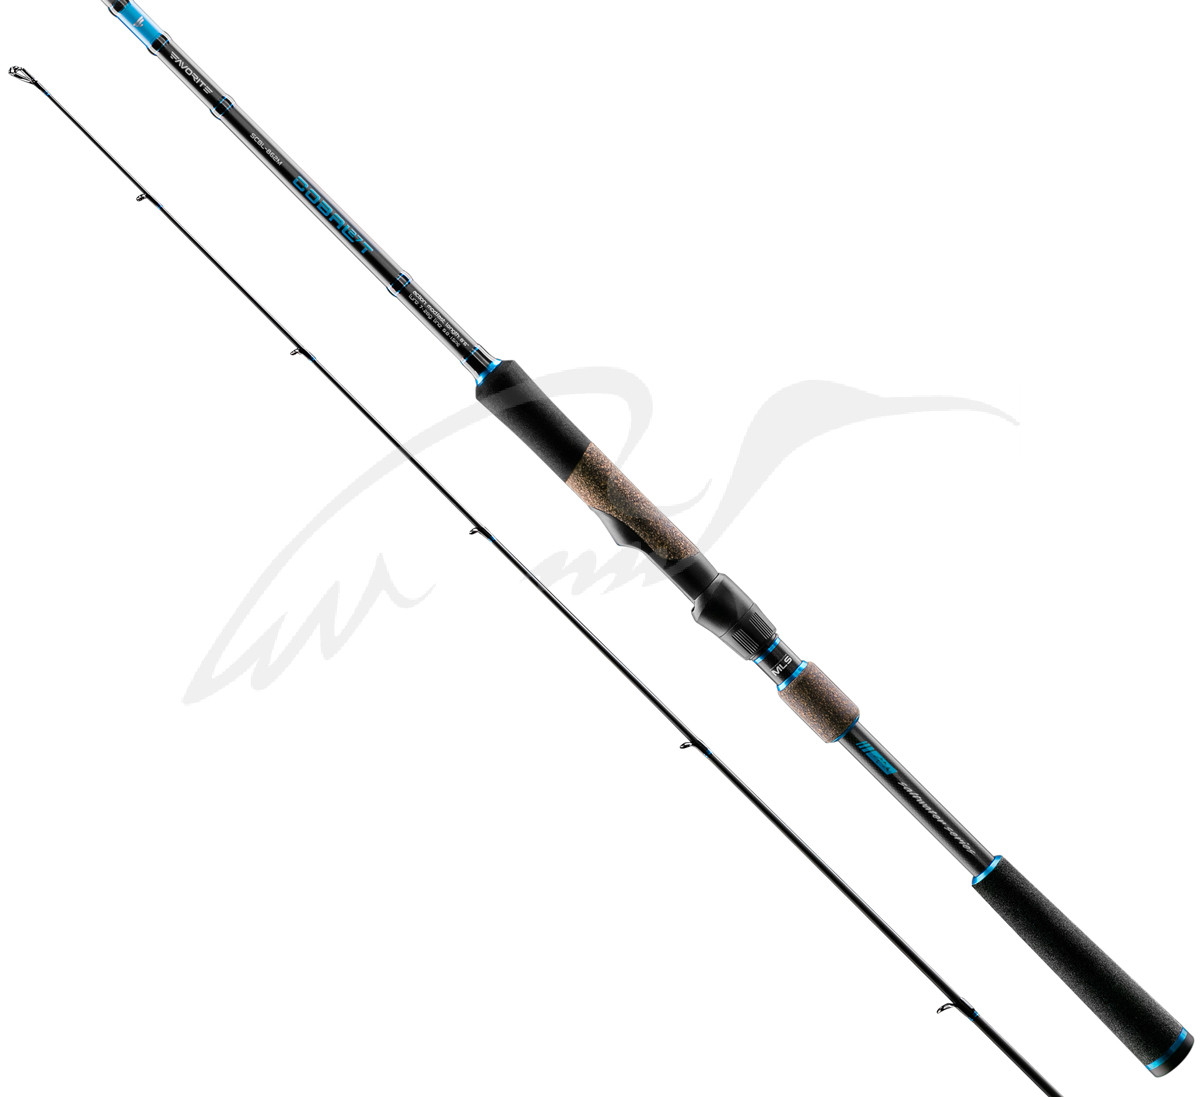 Спінінг Favorite SW Cobalt SCBL-802ML 2.44 m 5-18g PE #0.6-1.0 Mod.Fast